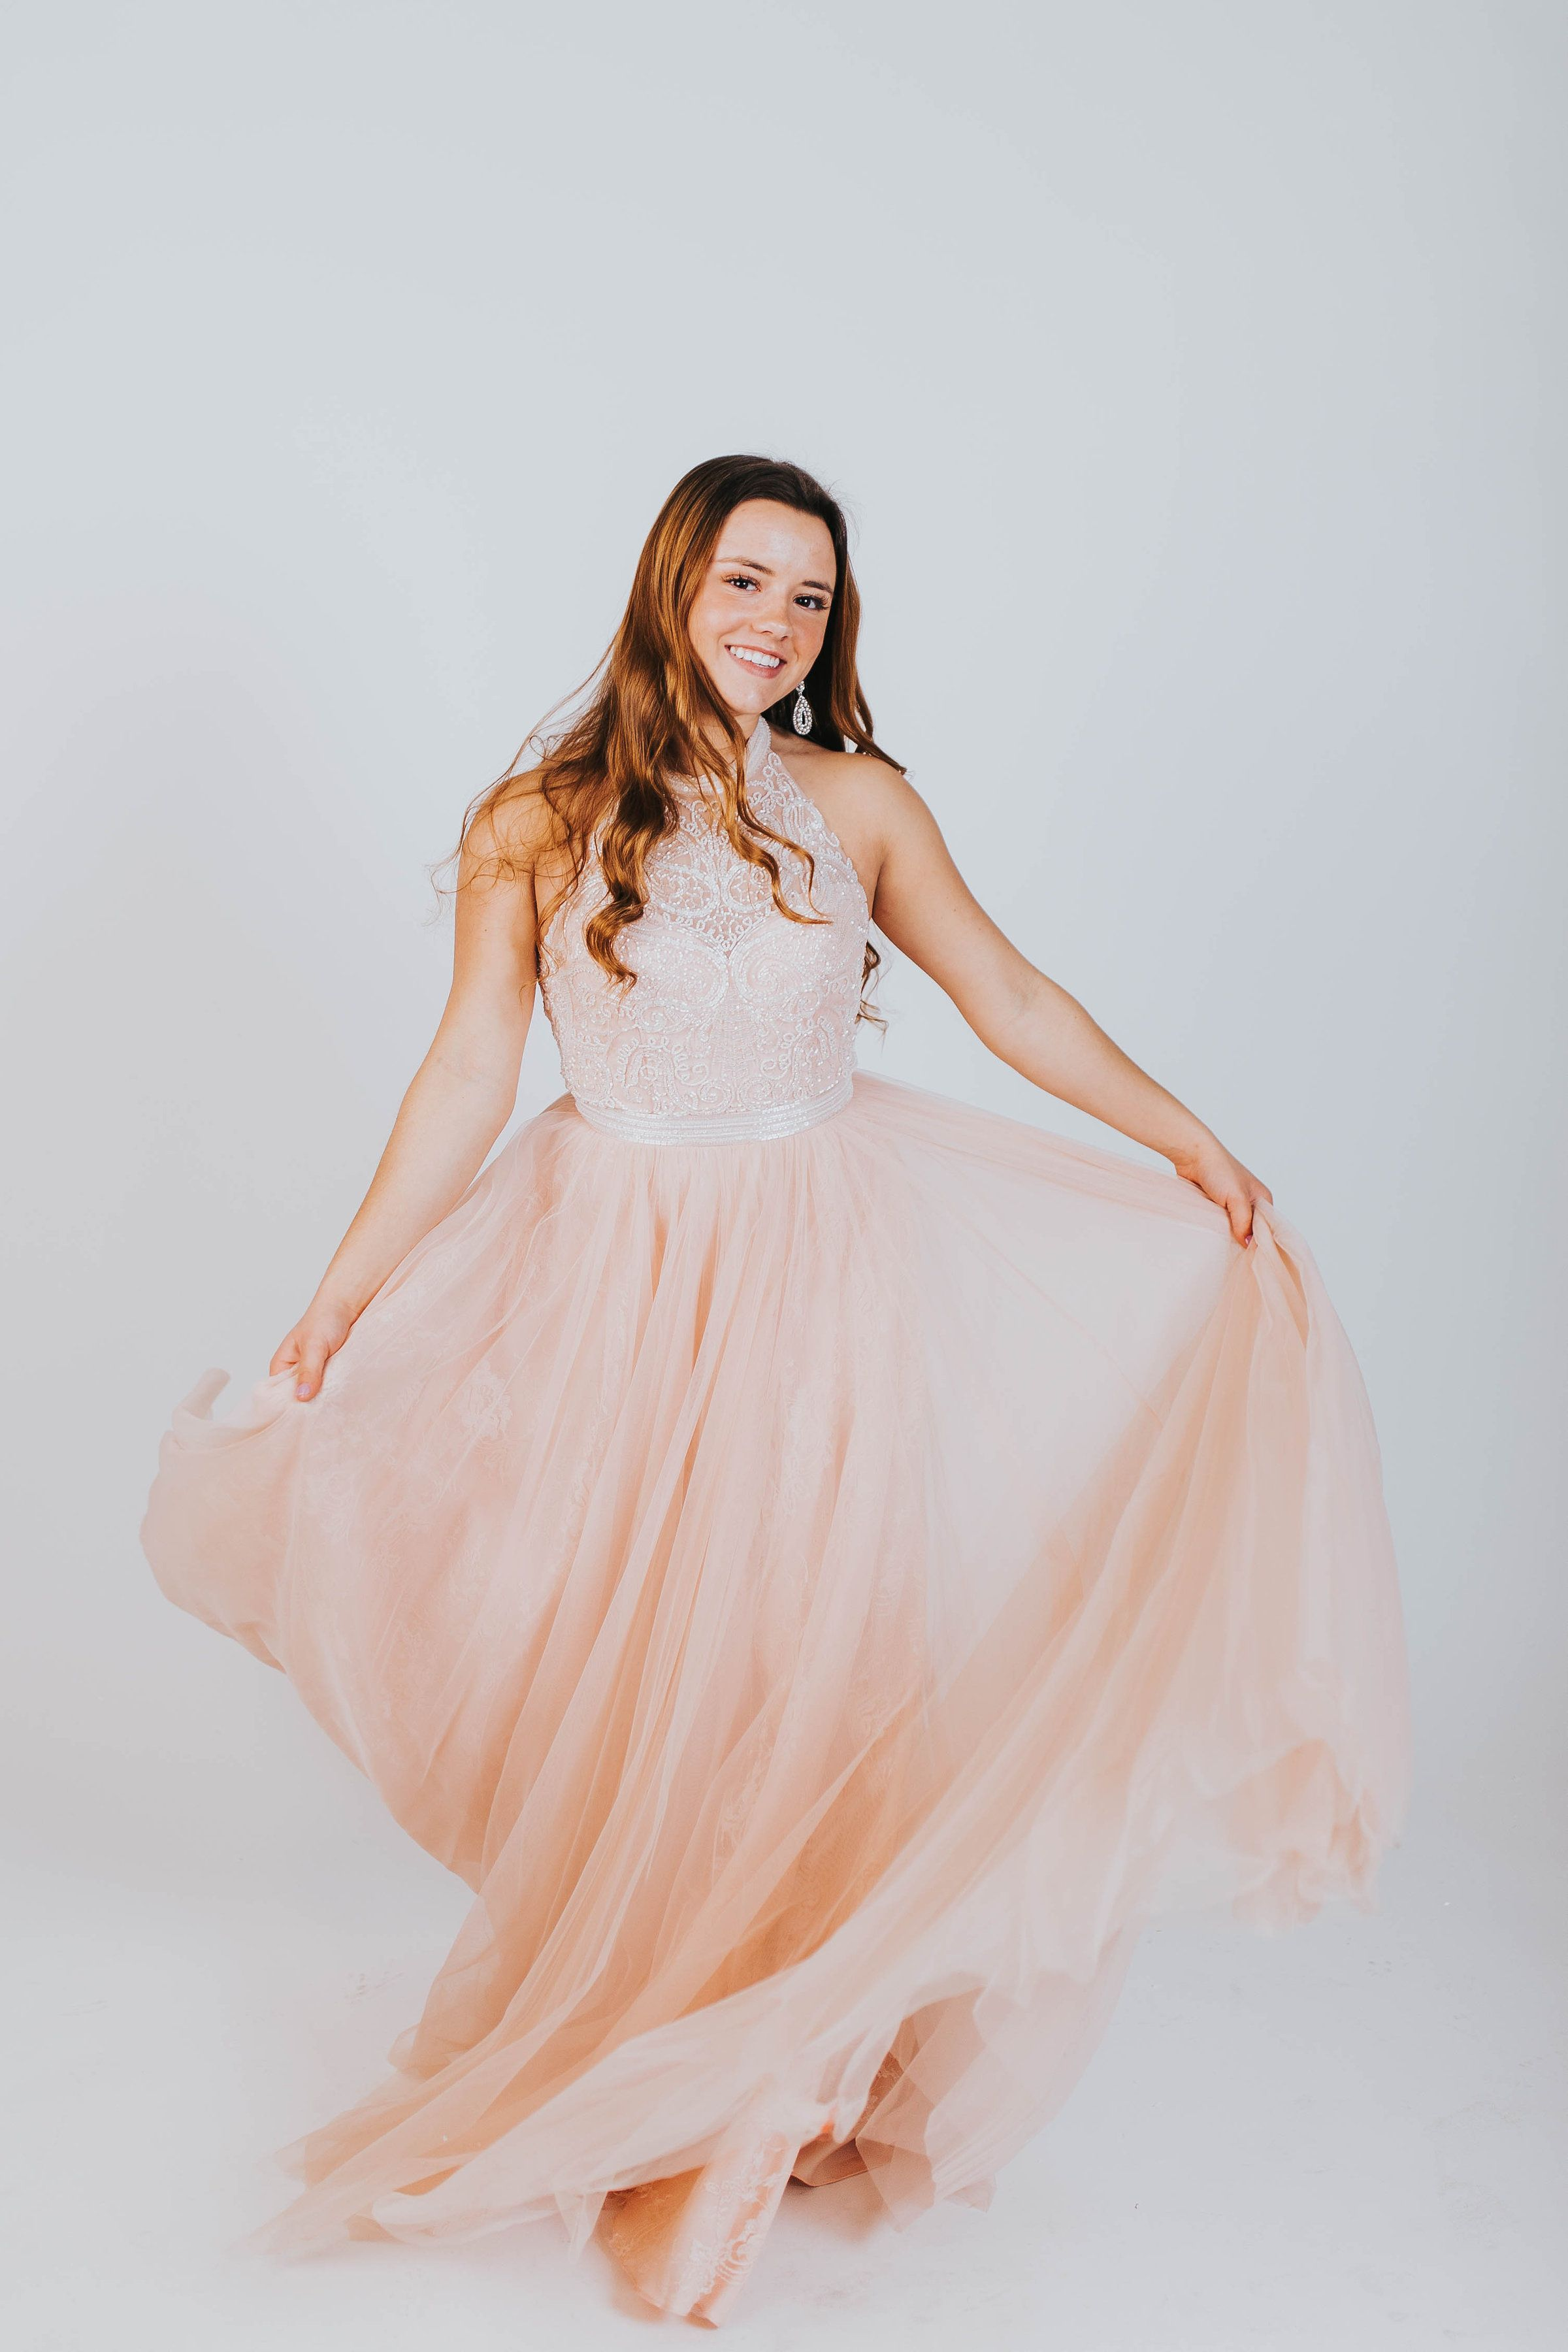 Utah prom dress light pink long dress light pink prom dress dress